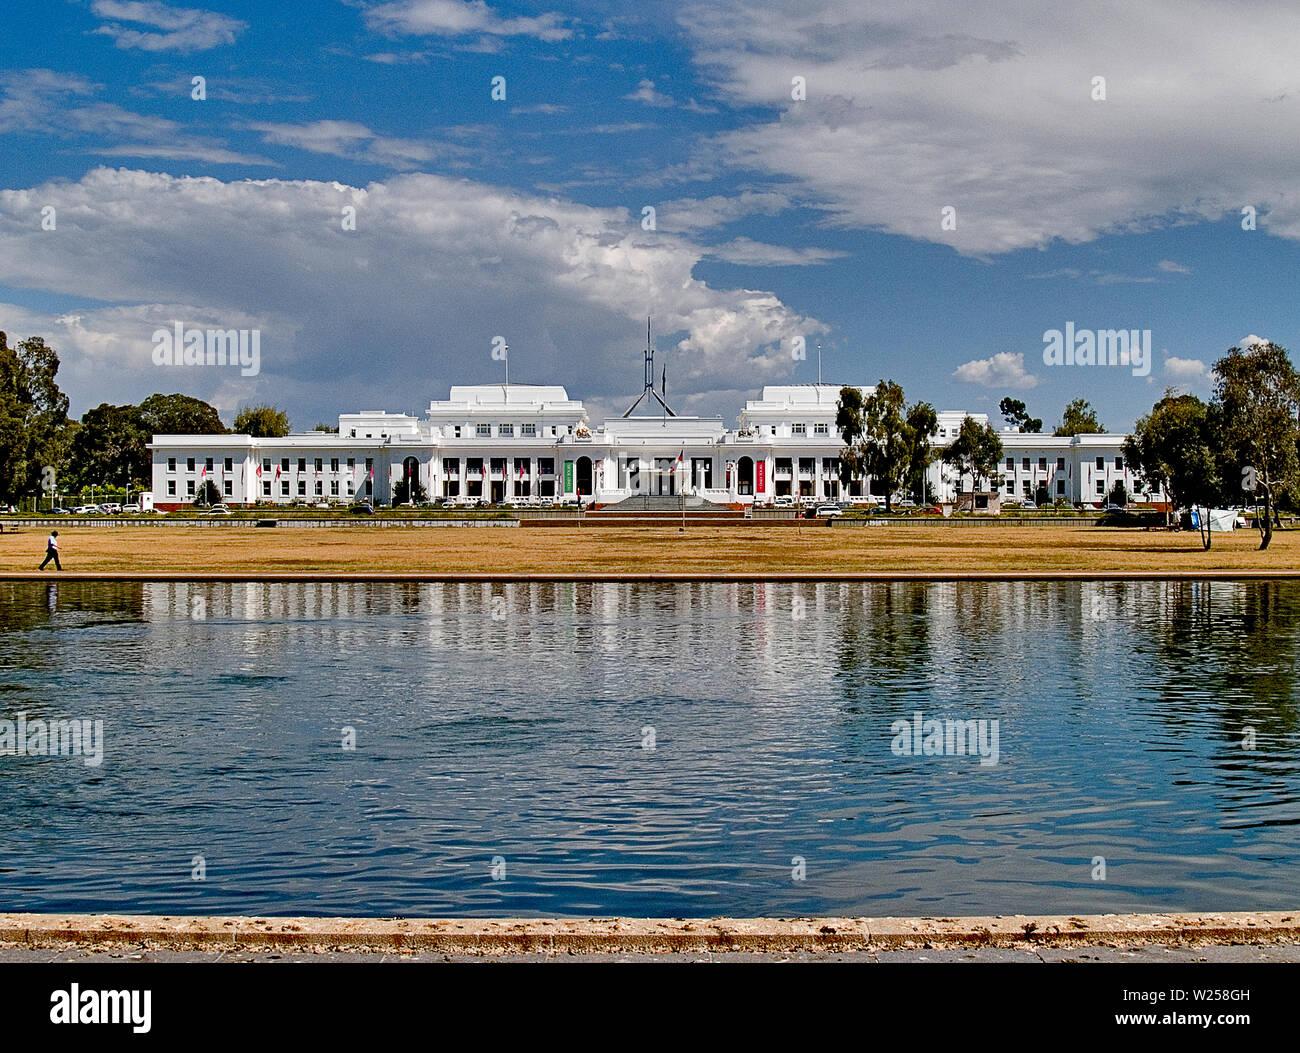 Australia: Old Parliament House, Canberra, Australian